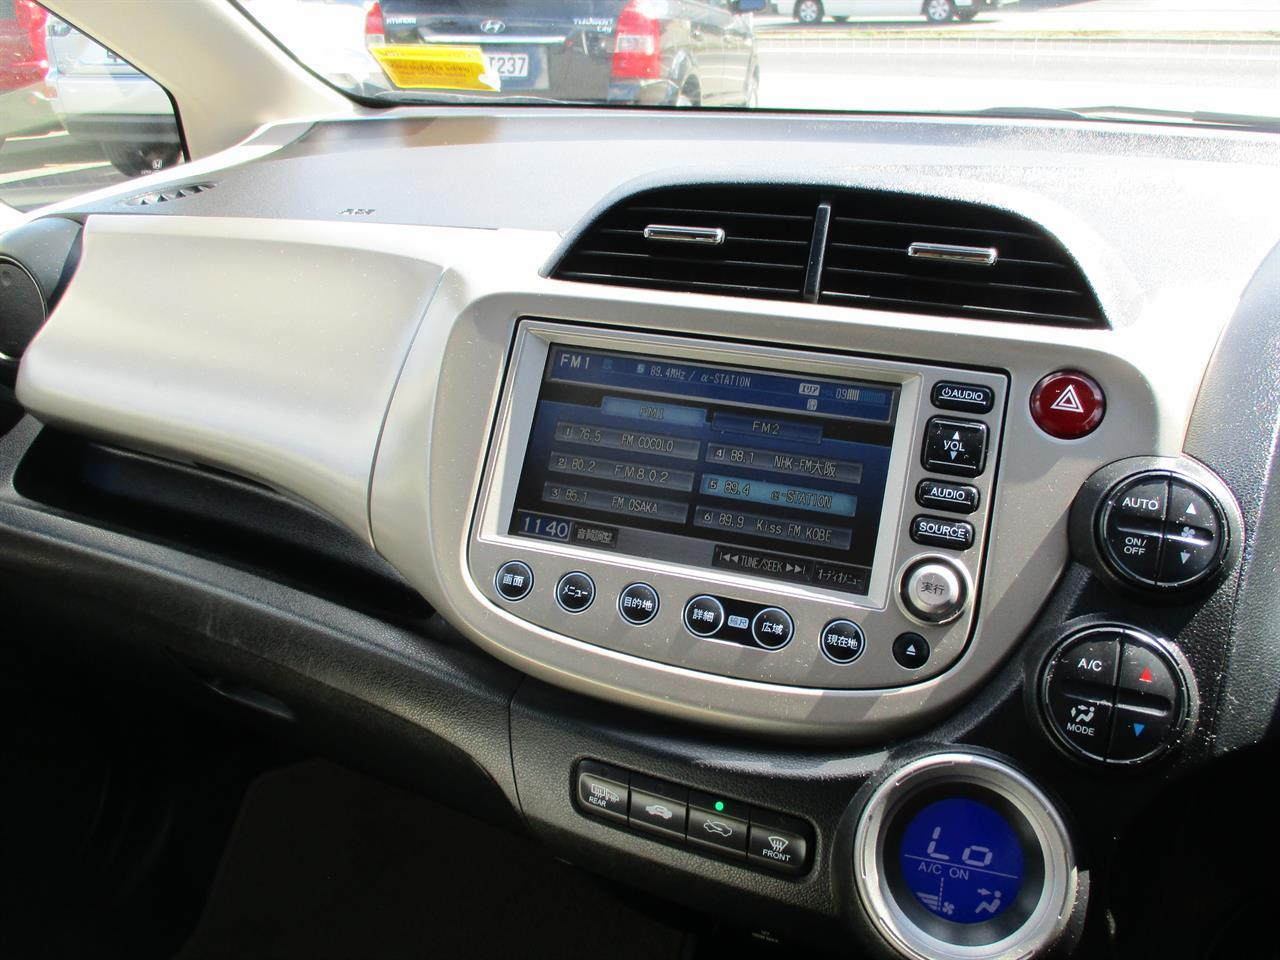 image-19, 2011 Honda Fit Hybrid at Dunedin